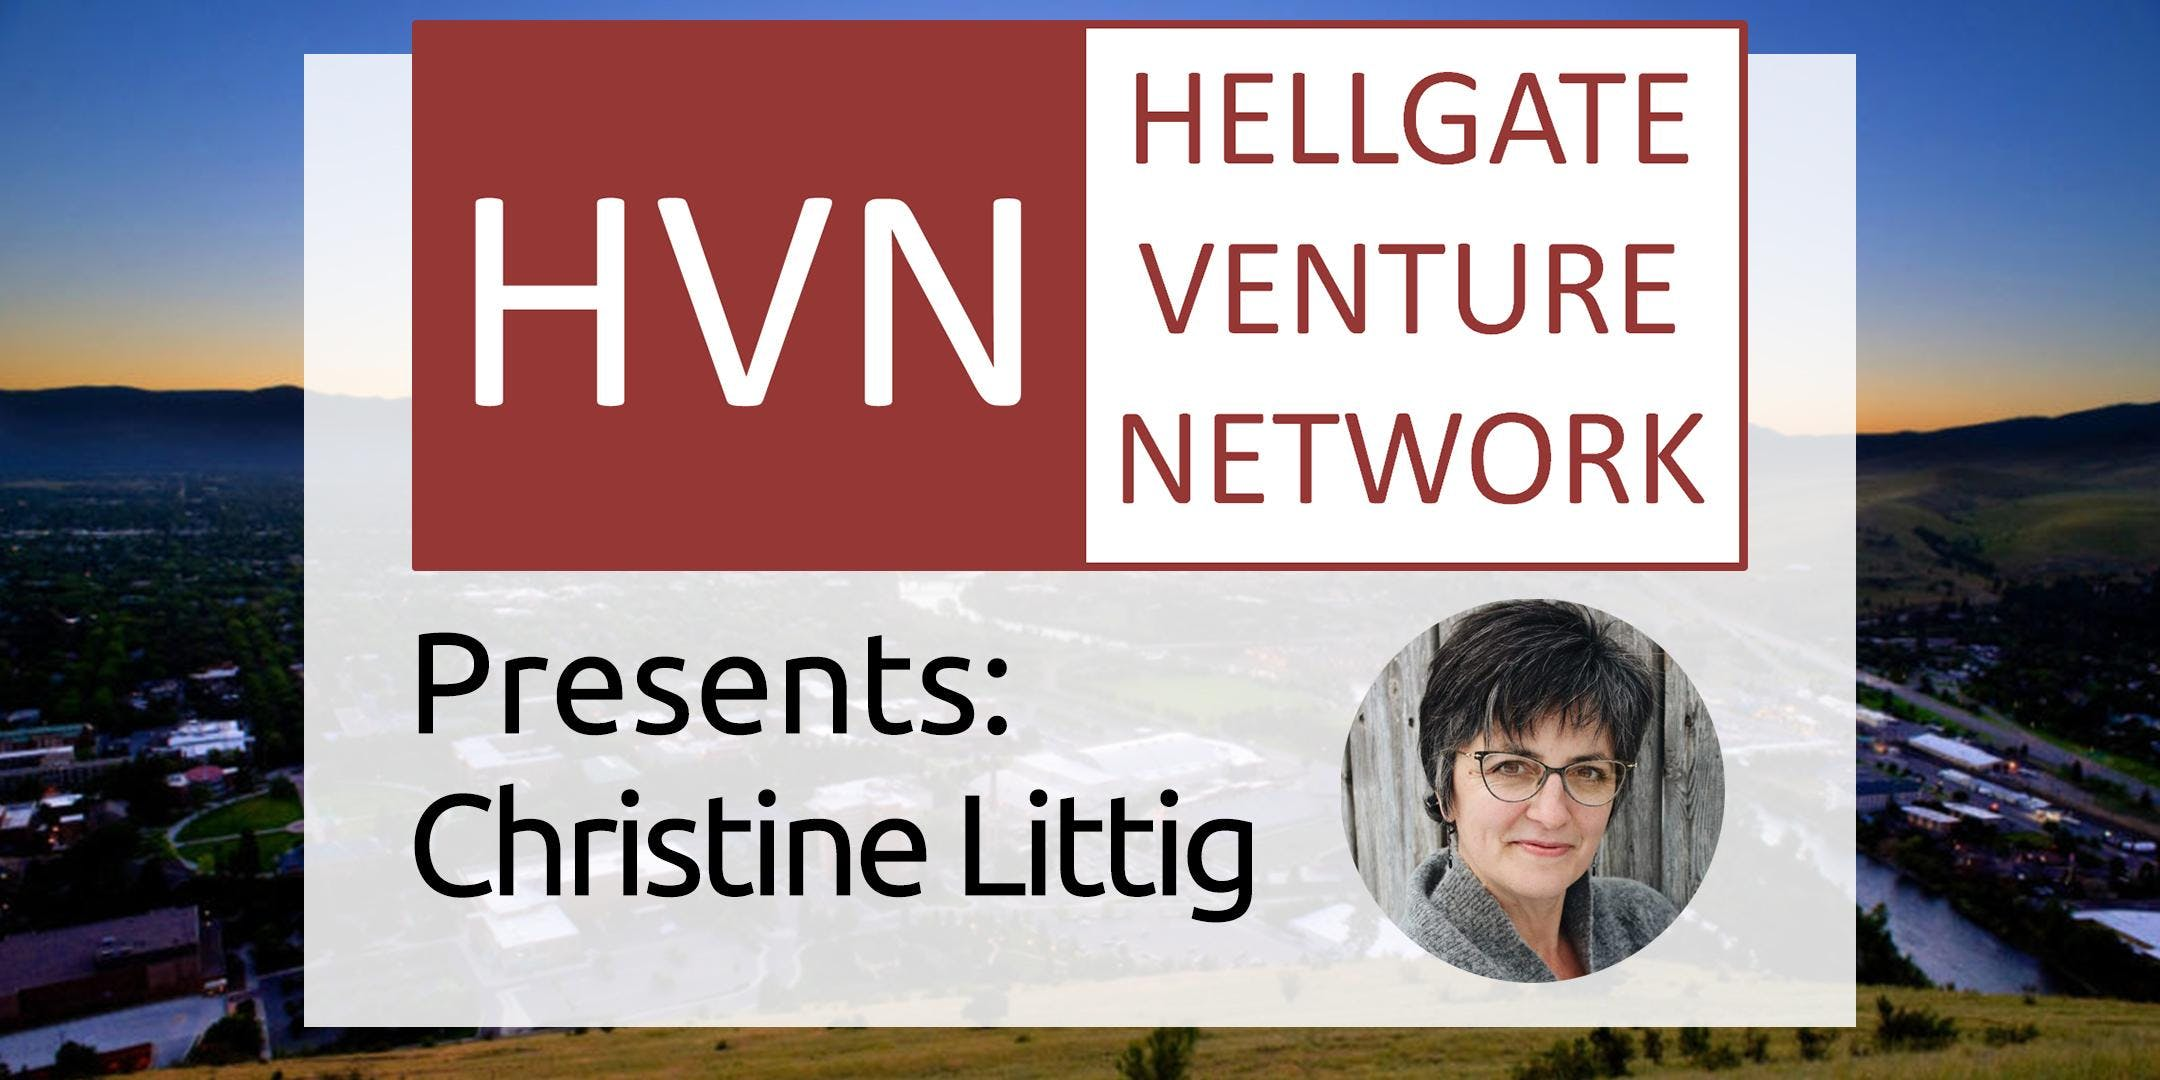 HVN featuring Christine Littig of The Red Bir